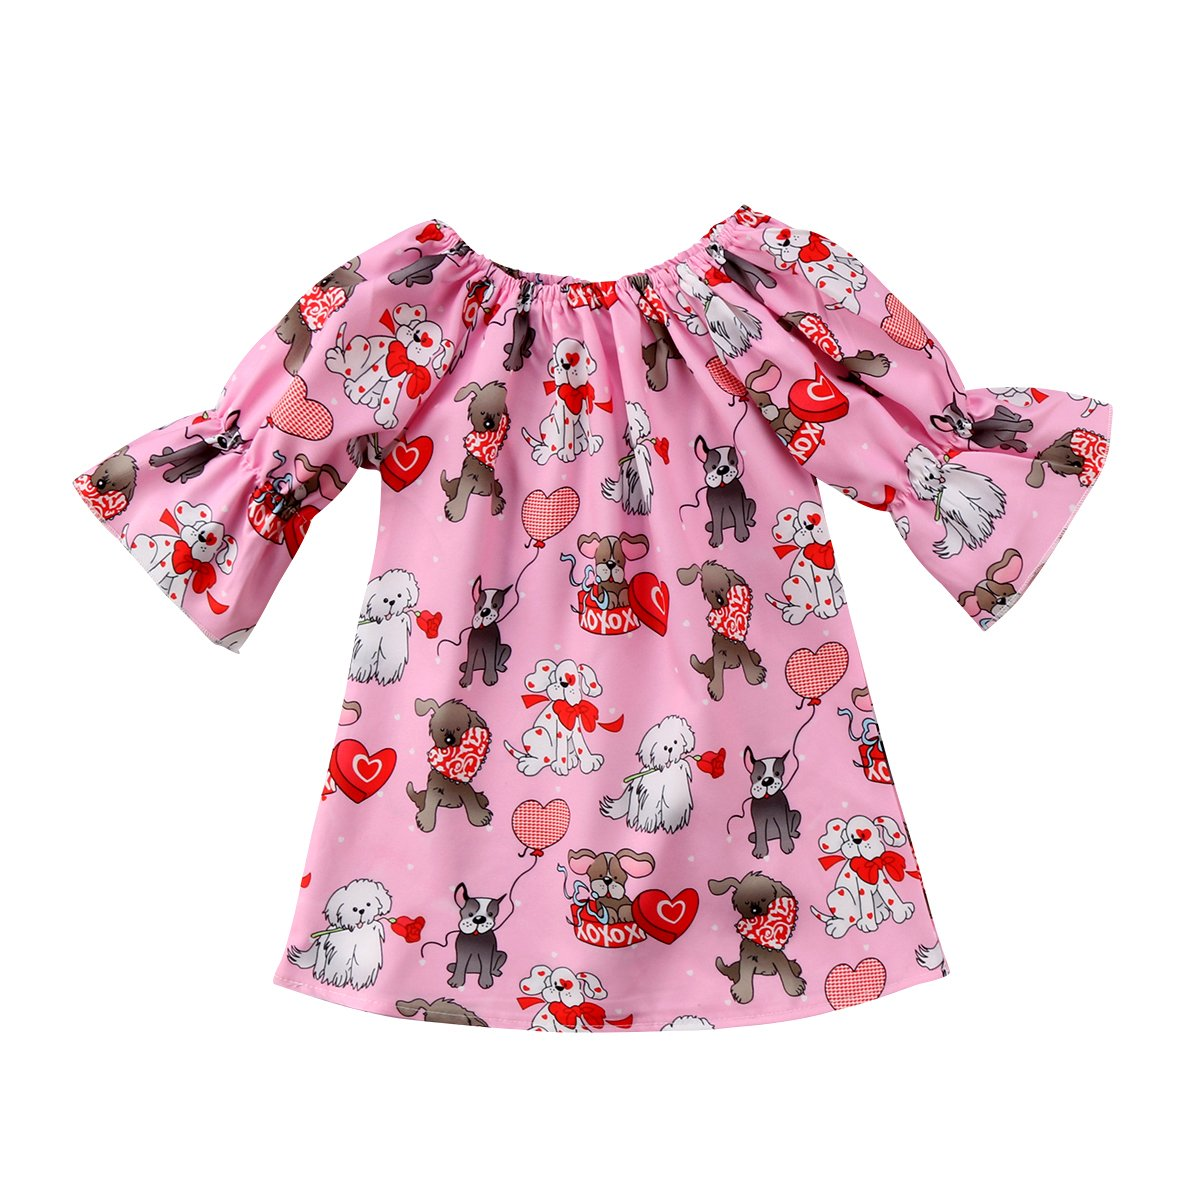 2b899240c Round collar half sleeve red short swing dress. Christmas modern style,  reindeer design. Both hand wash and machine wash is OK